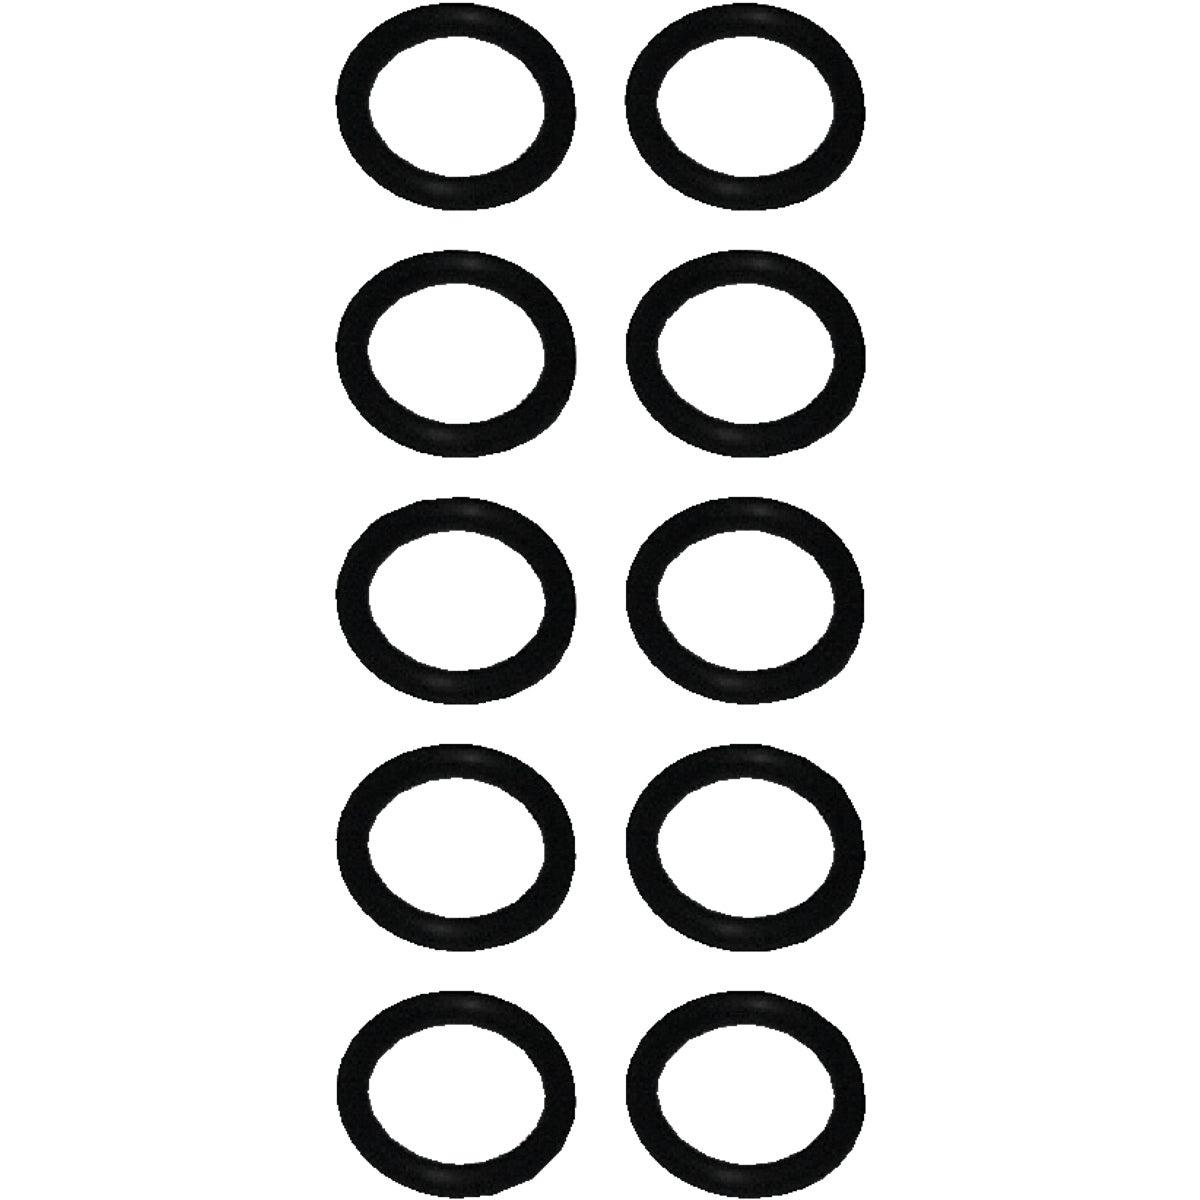 10PK O-RINGS